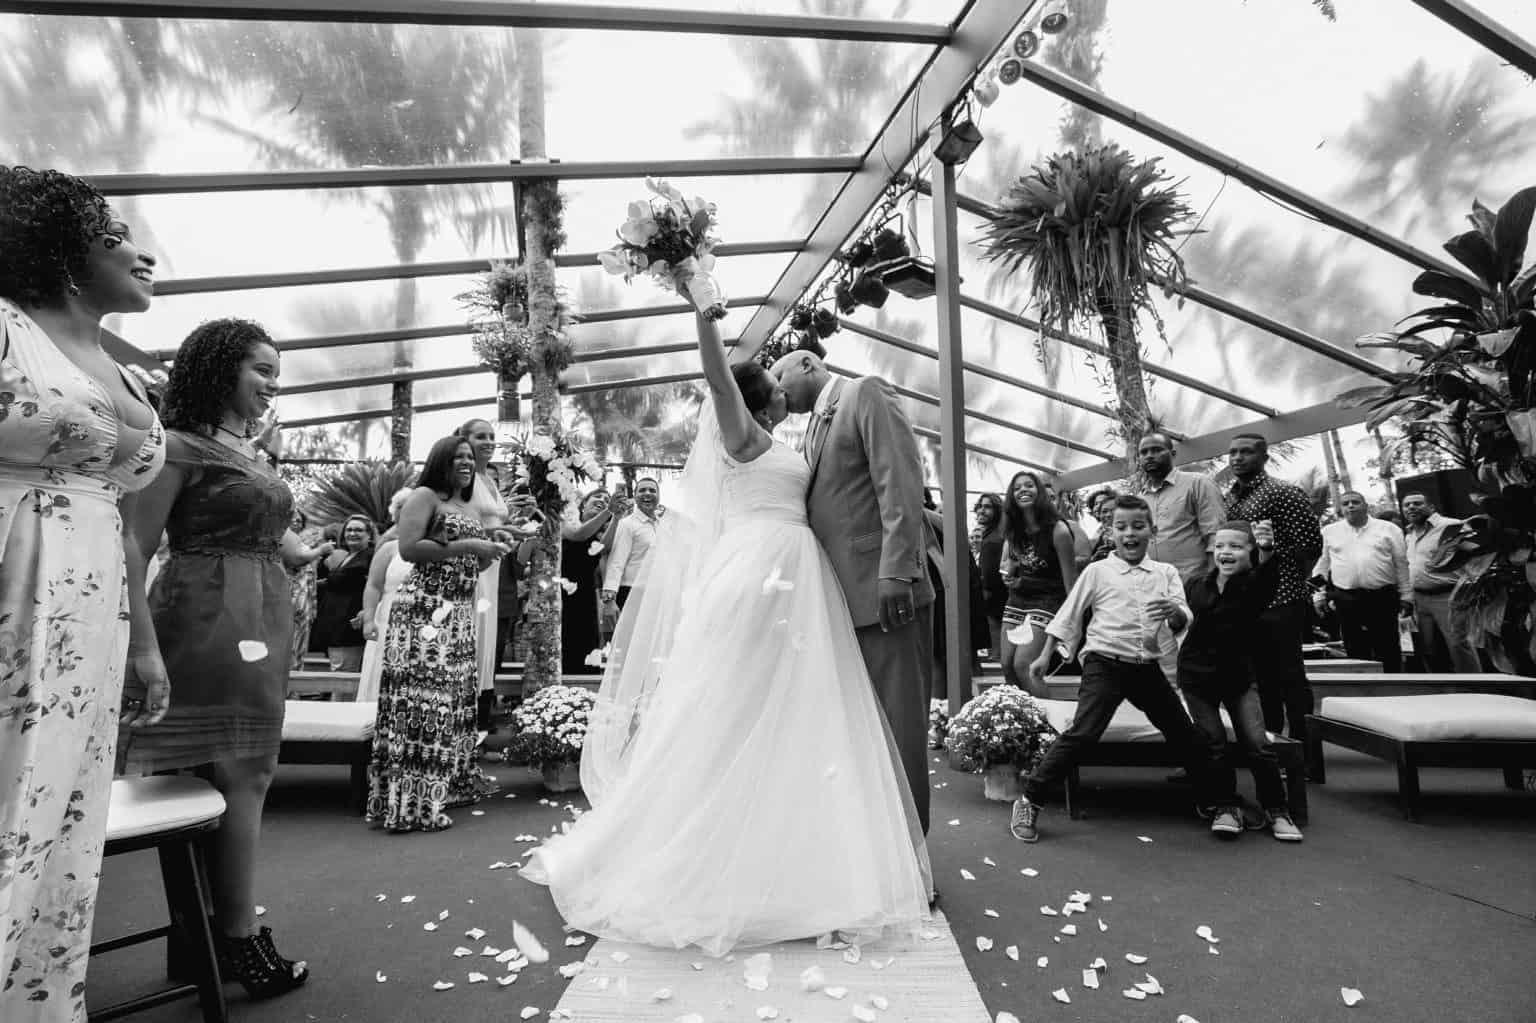 casamento-karina-e-marcos-felizes-para-sempre-caseme-21